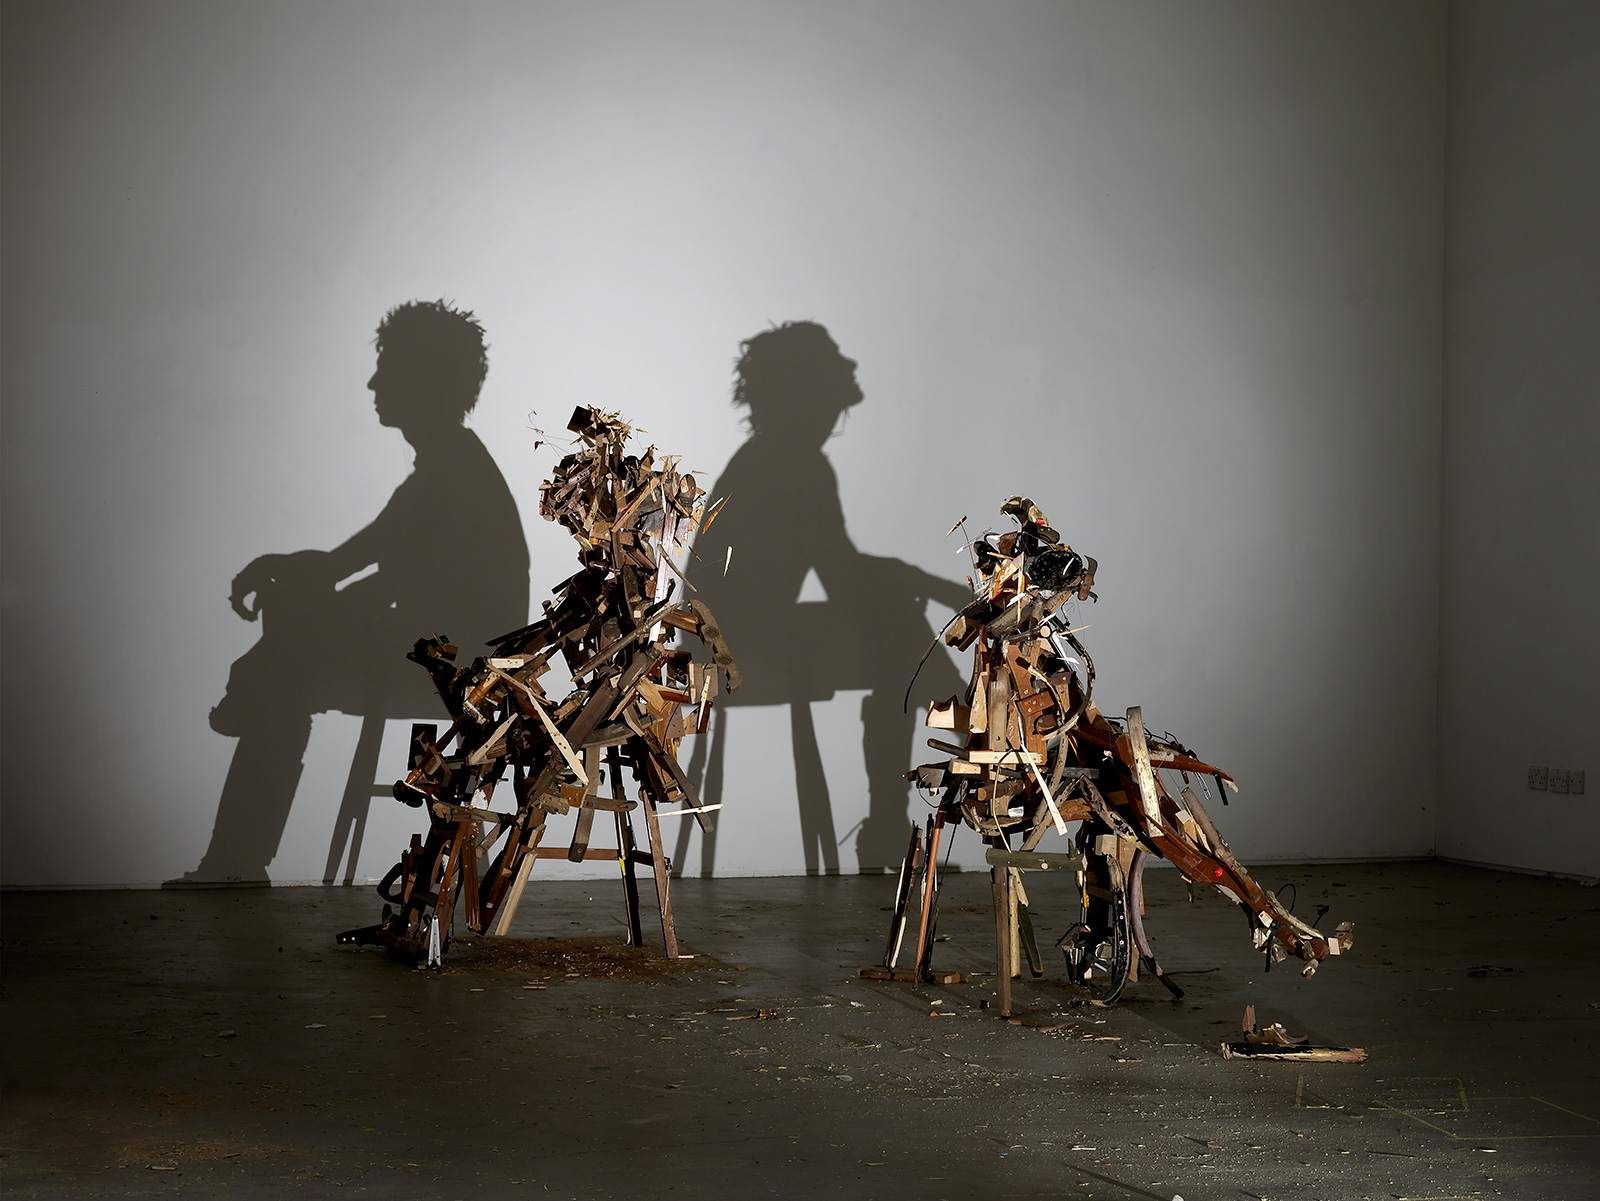 figurative shadow art from wood debris